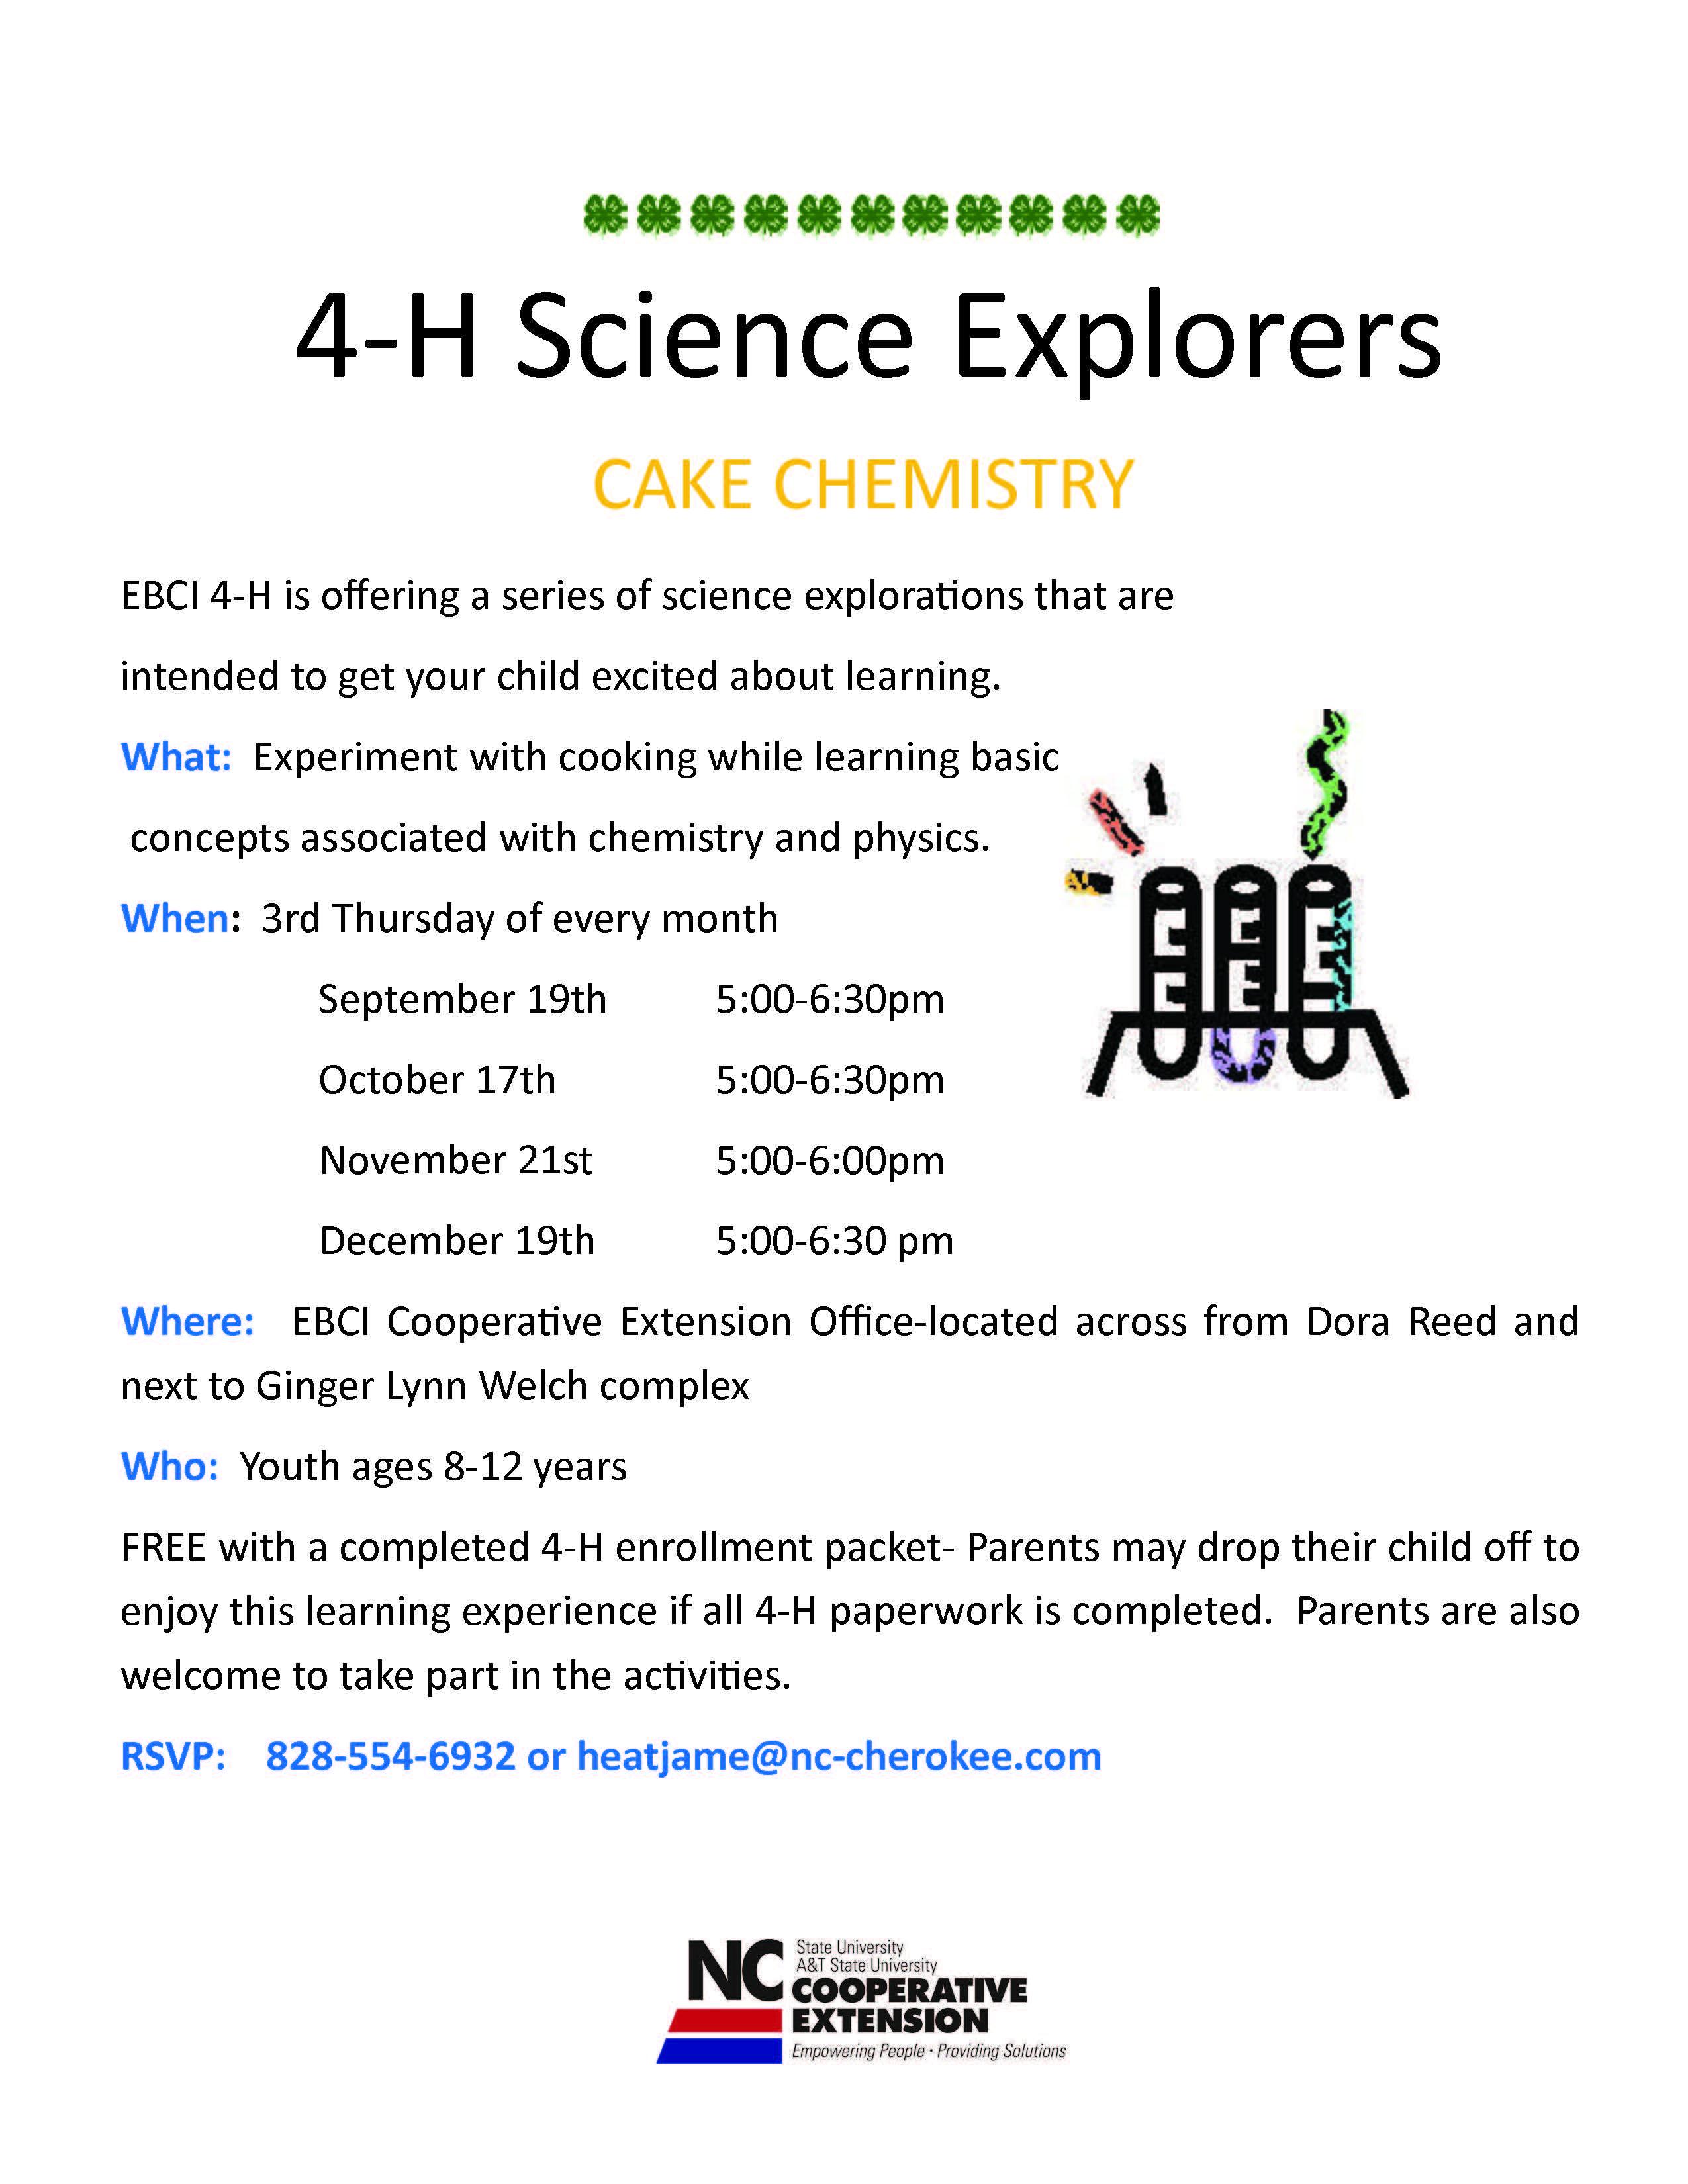 4-H Science Explorers